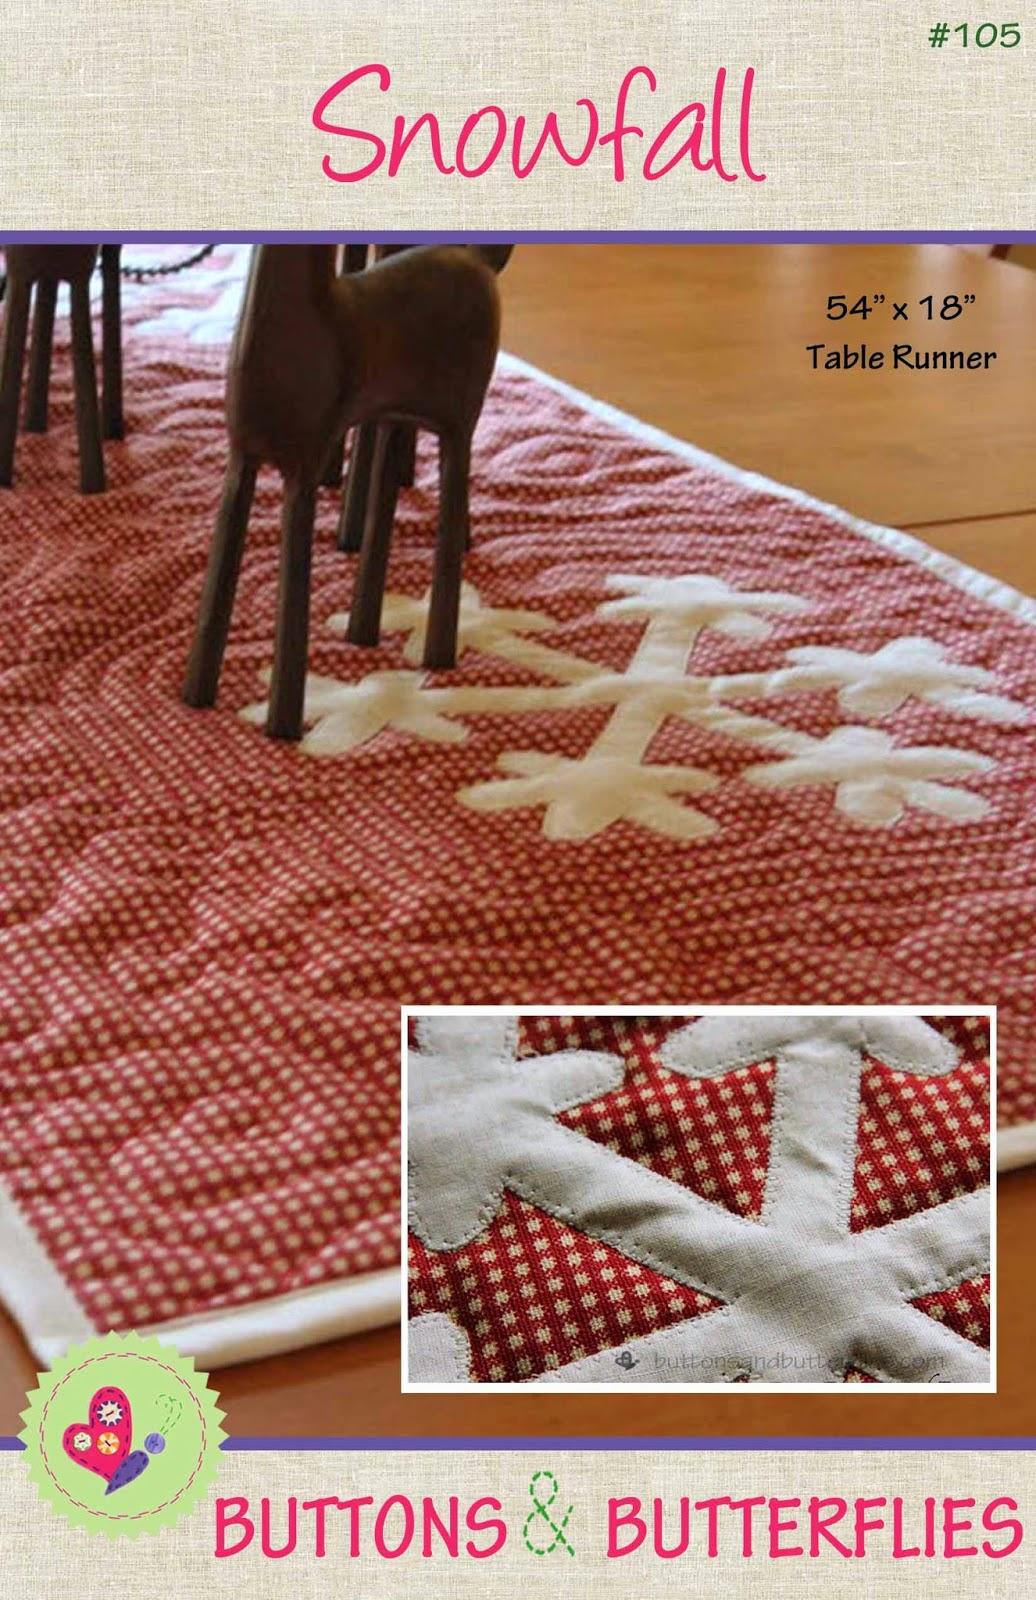 http://www.craftsy.com/pattern/quilting/home-decor/snowfall-tablerunner/124179